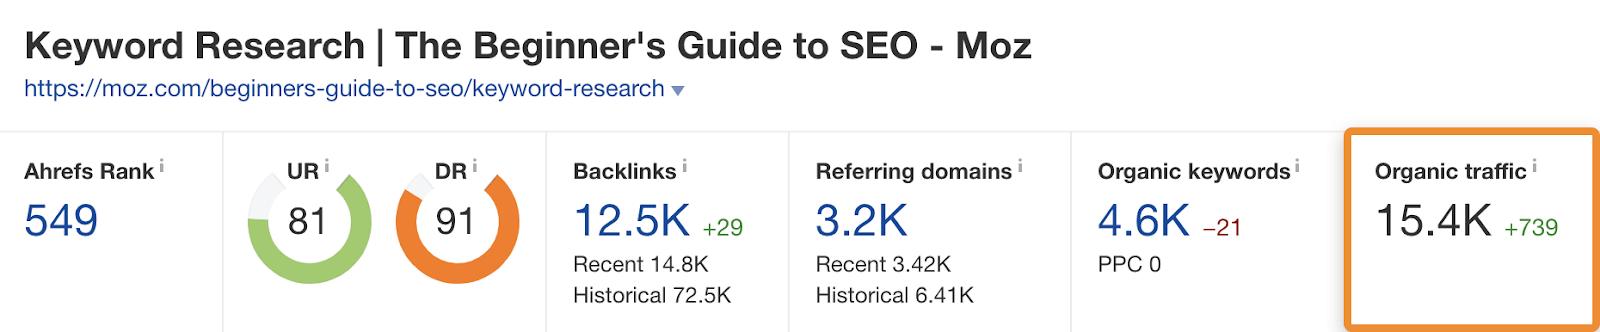 Top关键词搜索流量统计